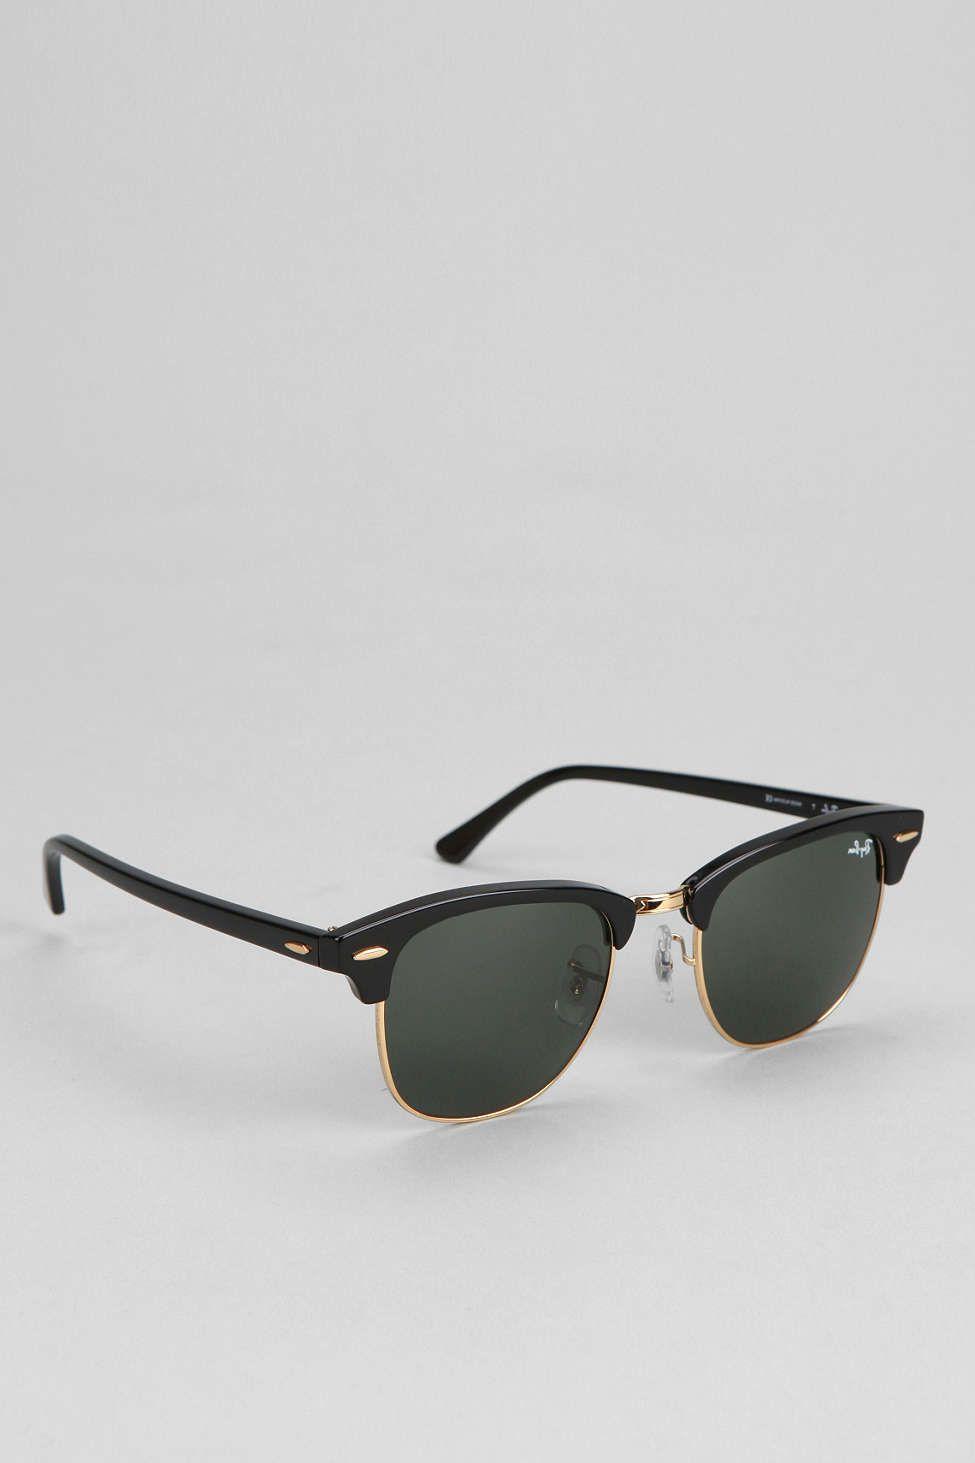 9af5bdafd042 Ray-Ban Classic Clubmaster Sunglasses | Man Stuff | Ray bans ...